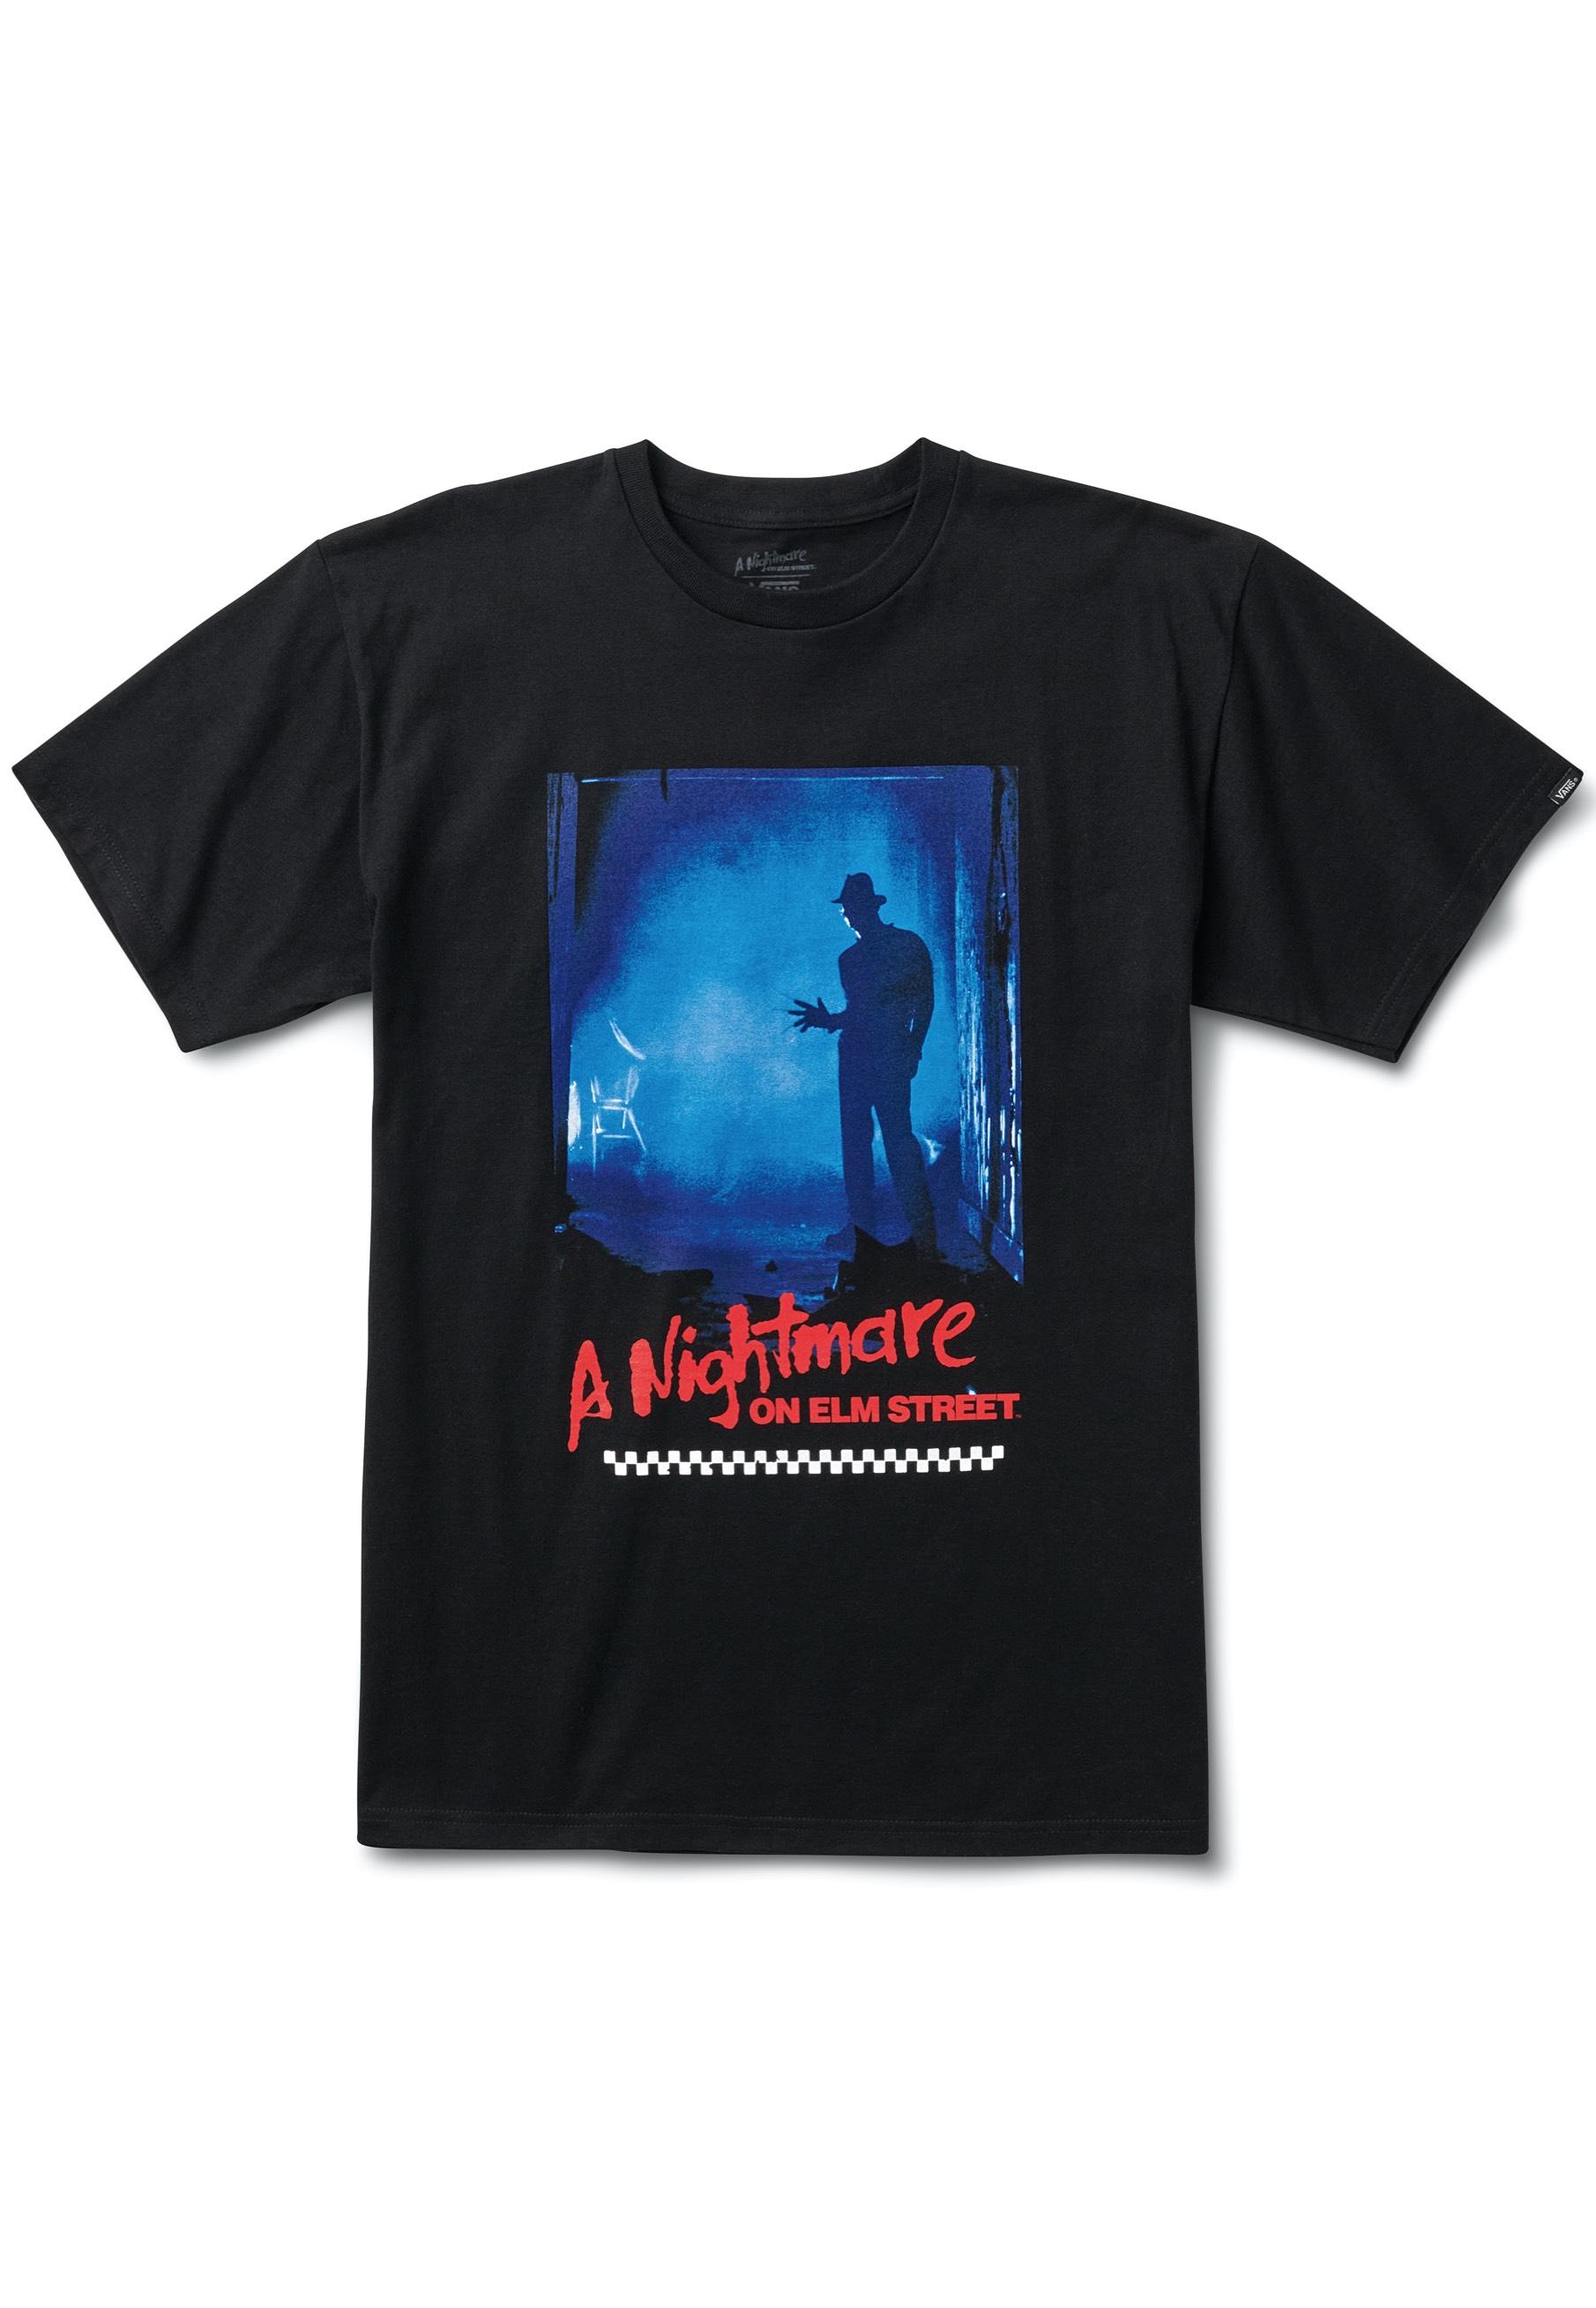 Vans x Horror Nightmare On Elm Street Black T-Shirt